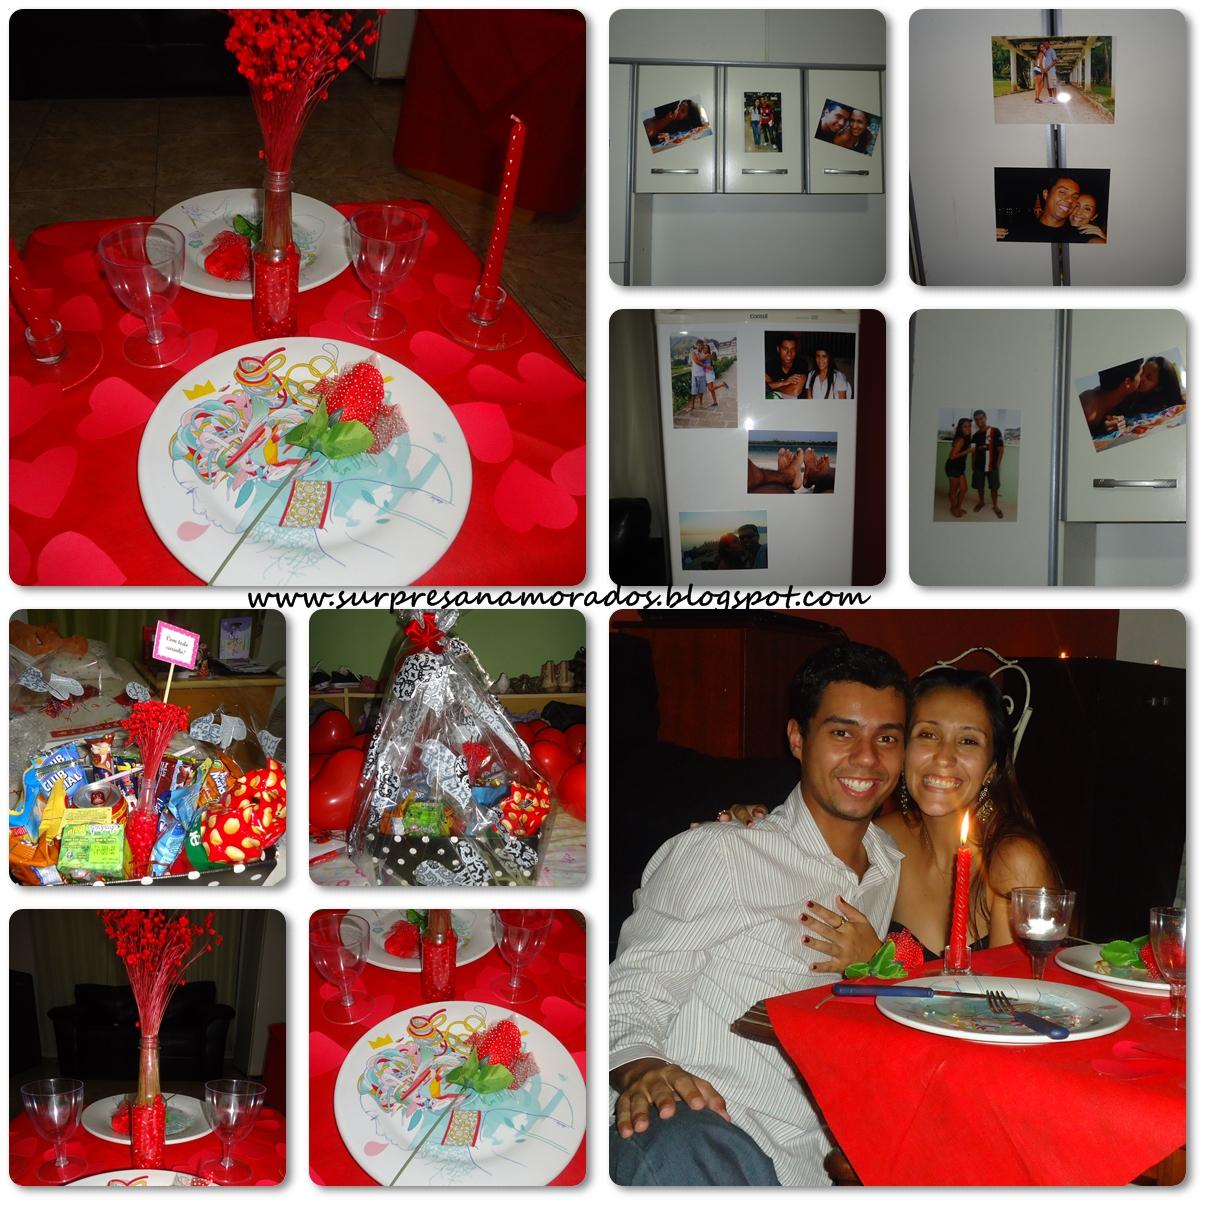 Aniversário de 2 anos de namoro  Surpresas para Namorados